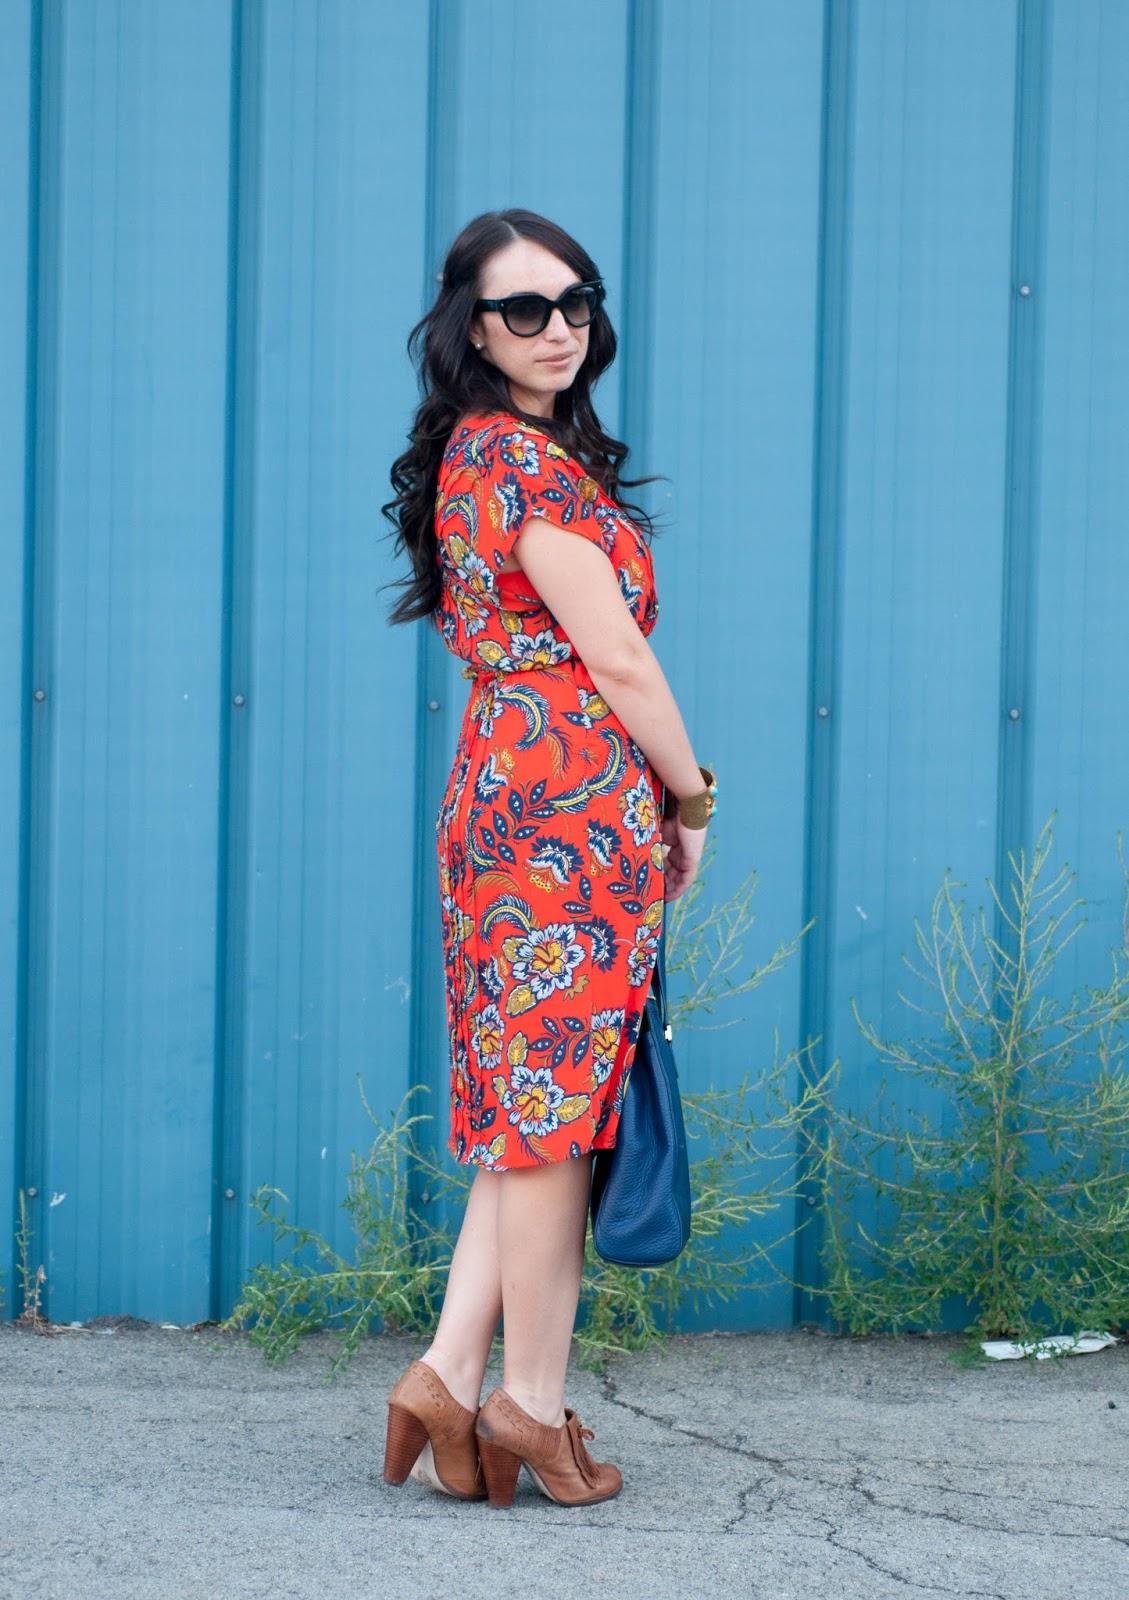 lands end dress, paisley print, boho dress, seychells heels, prada cat eye sunglasses, ootd